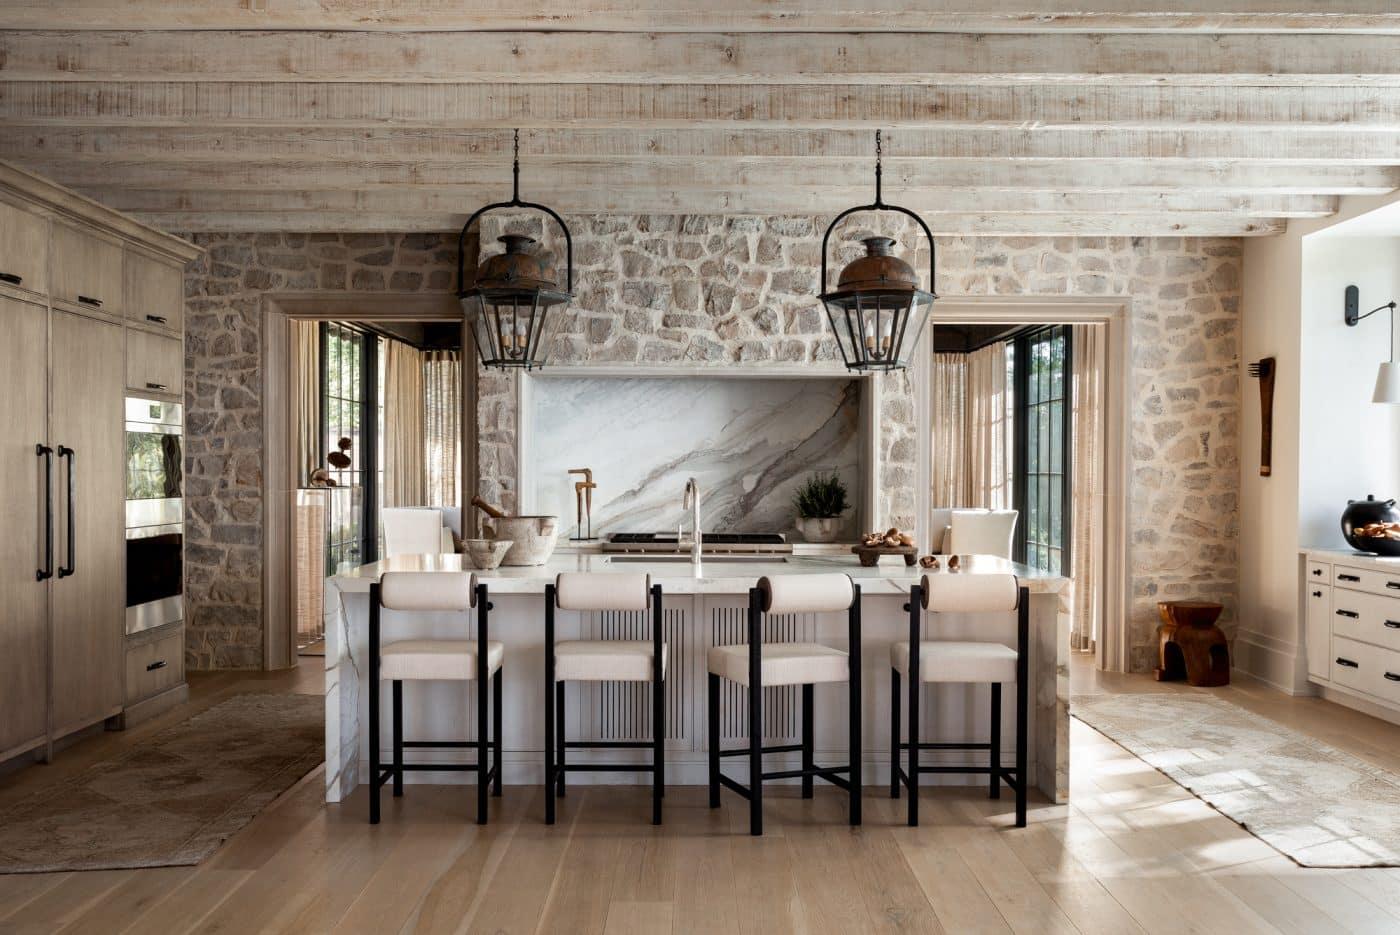 Kitchen designed by Sean Anderson